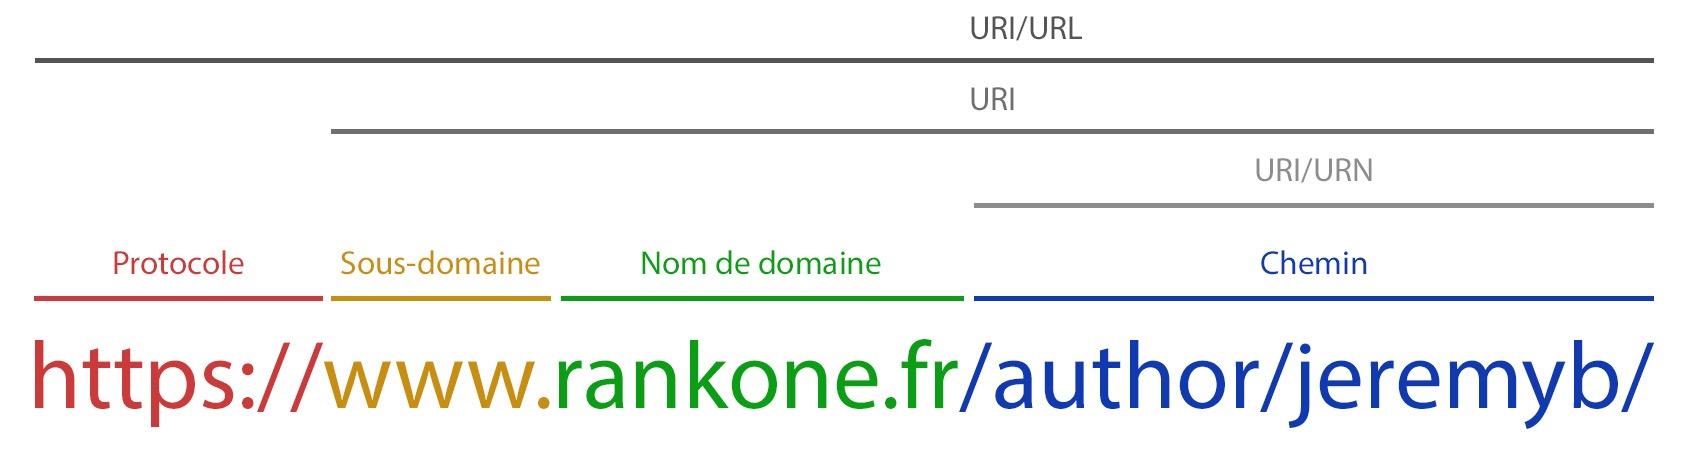 Structure URL URI et URN